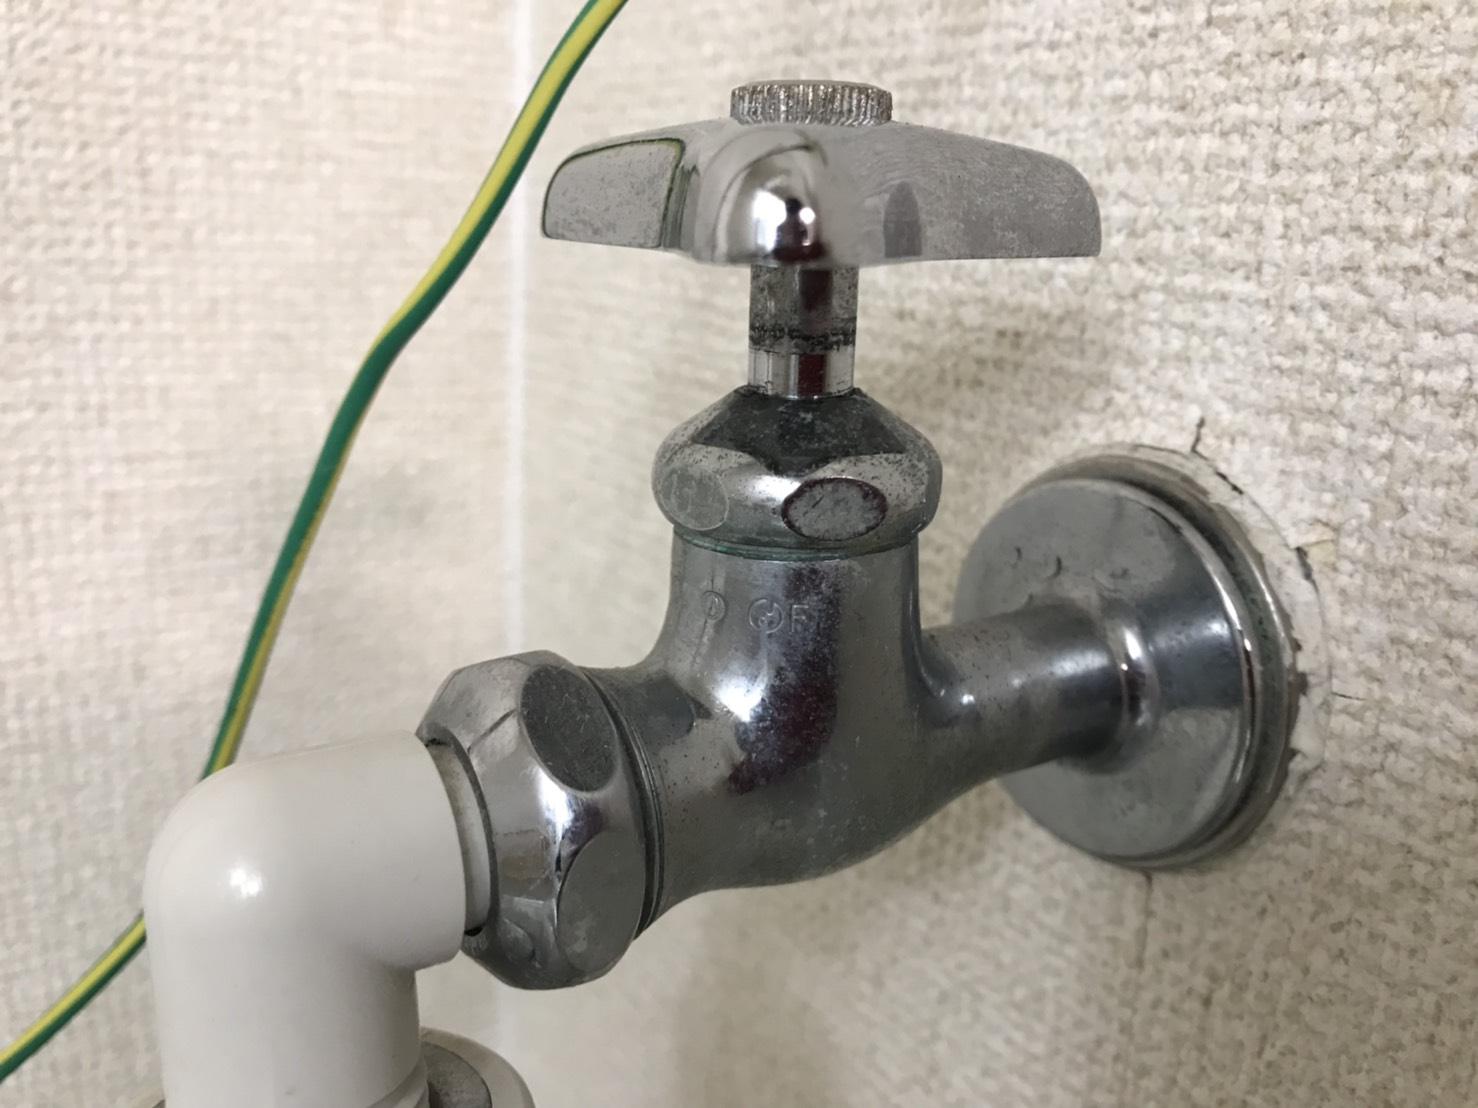 熊毛郡田布施町 洗濯蛇口水漏れ修理